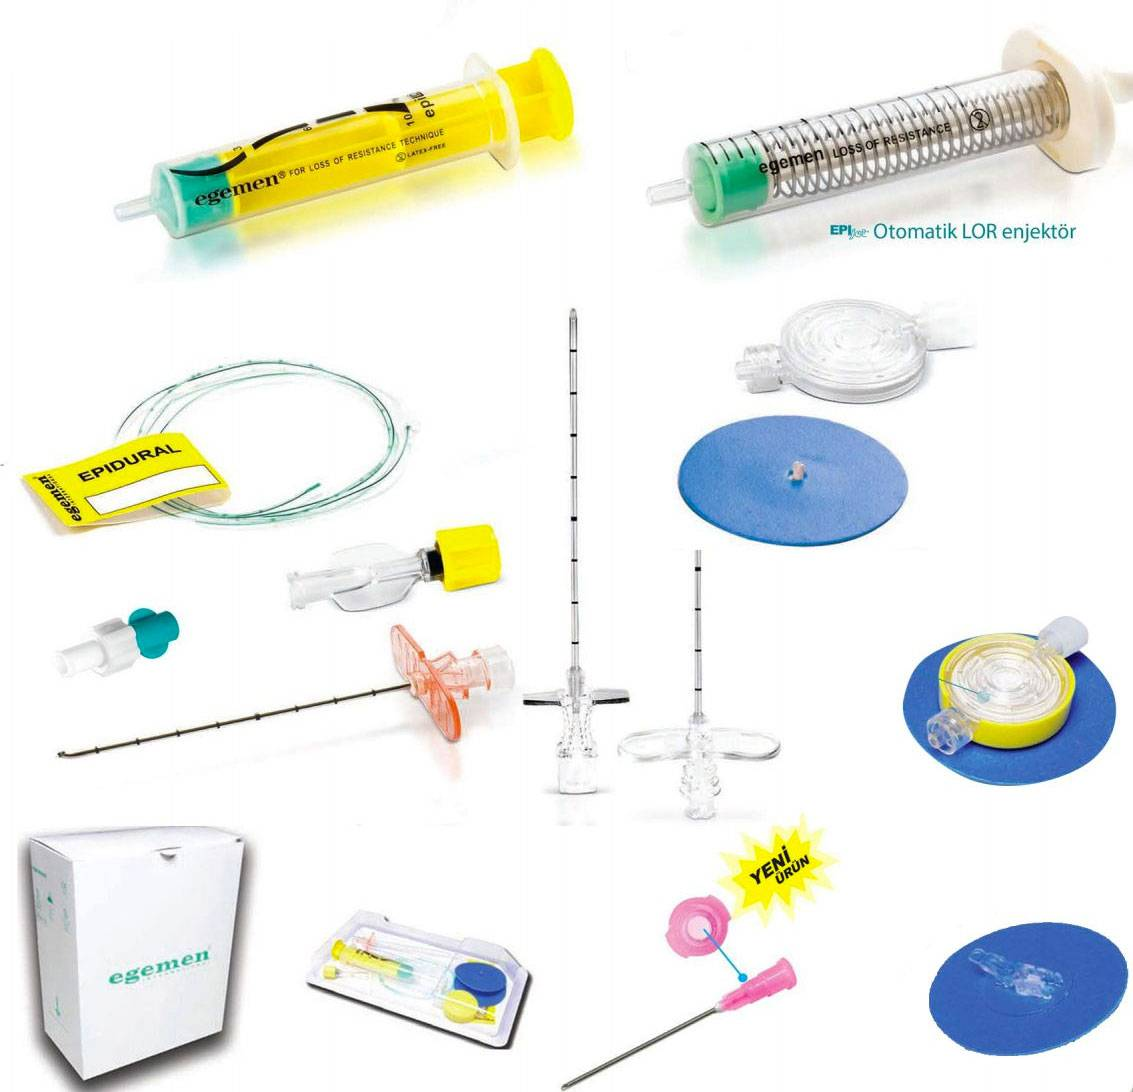 Epifix Epidural Anesthesia Sets